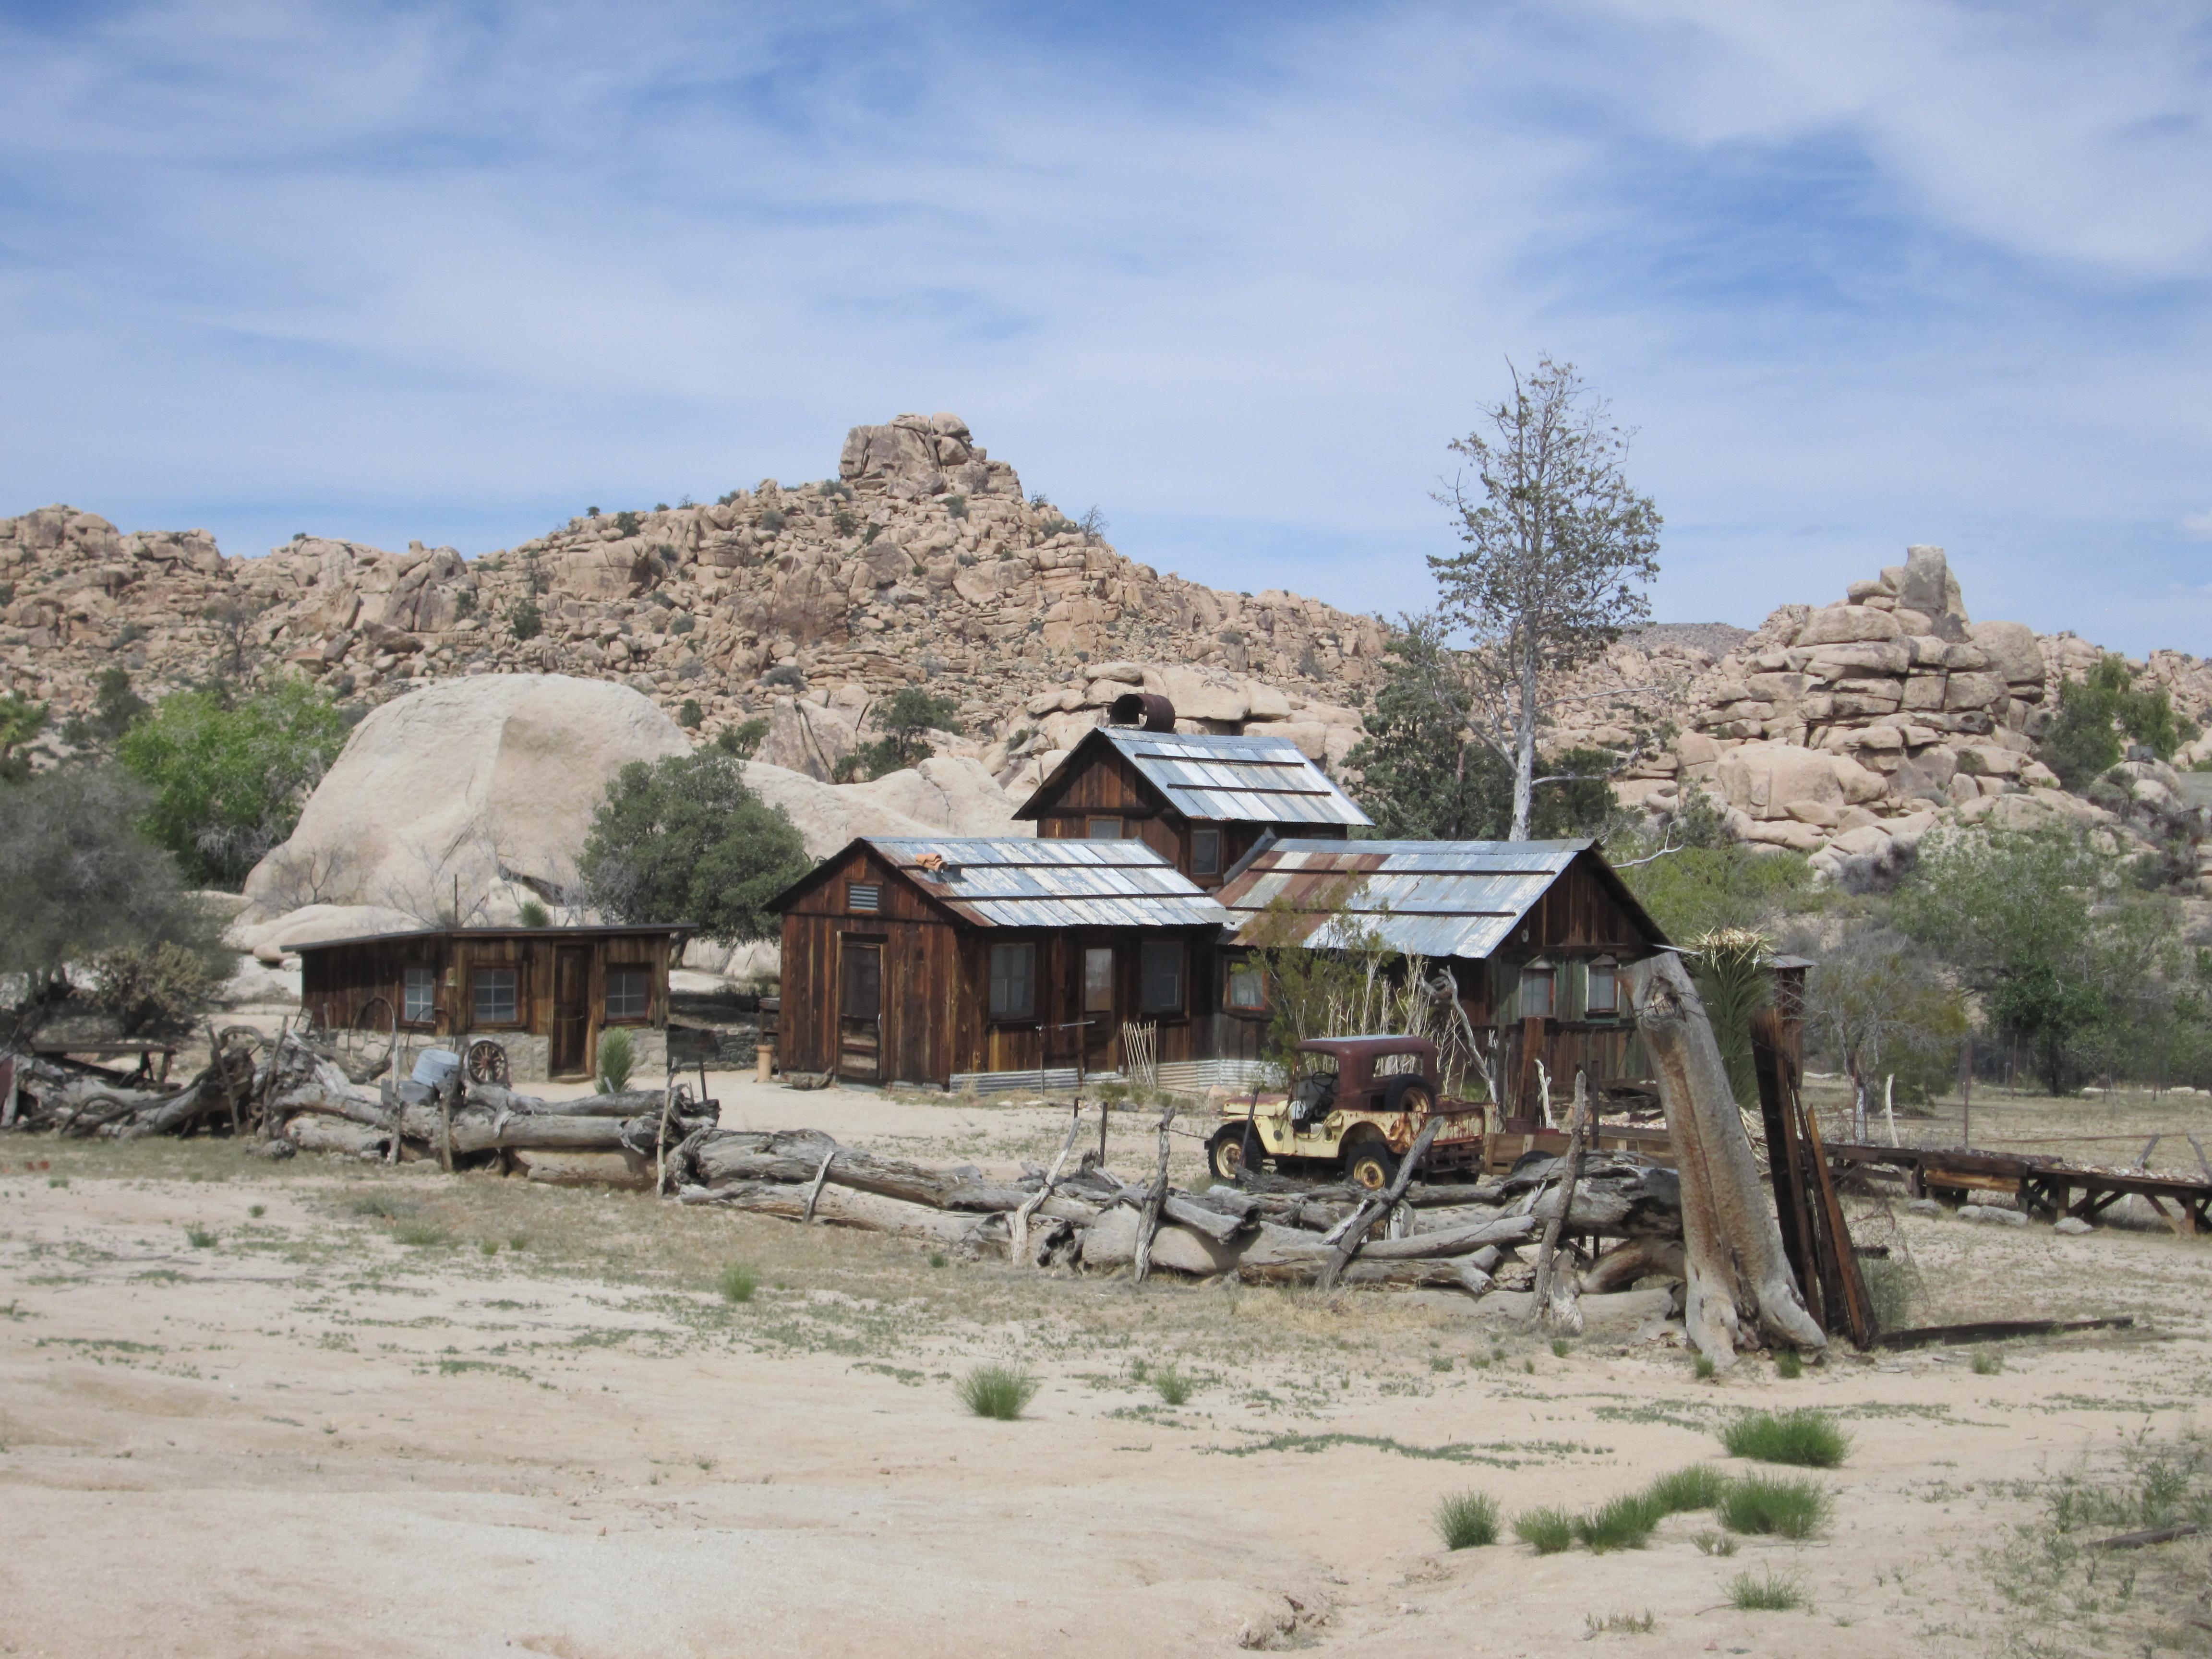 Joshua Tree National Park's Keys Ranch – A Tale of Pioneer Spirit ...